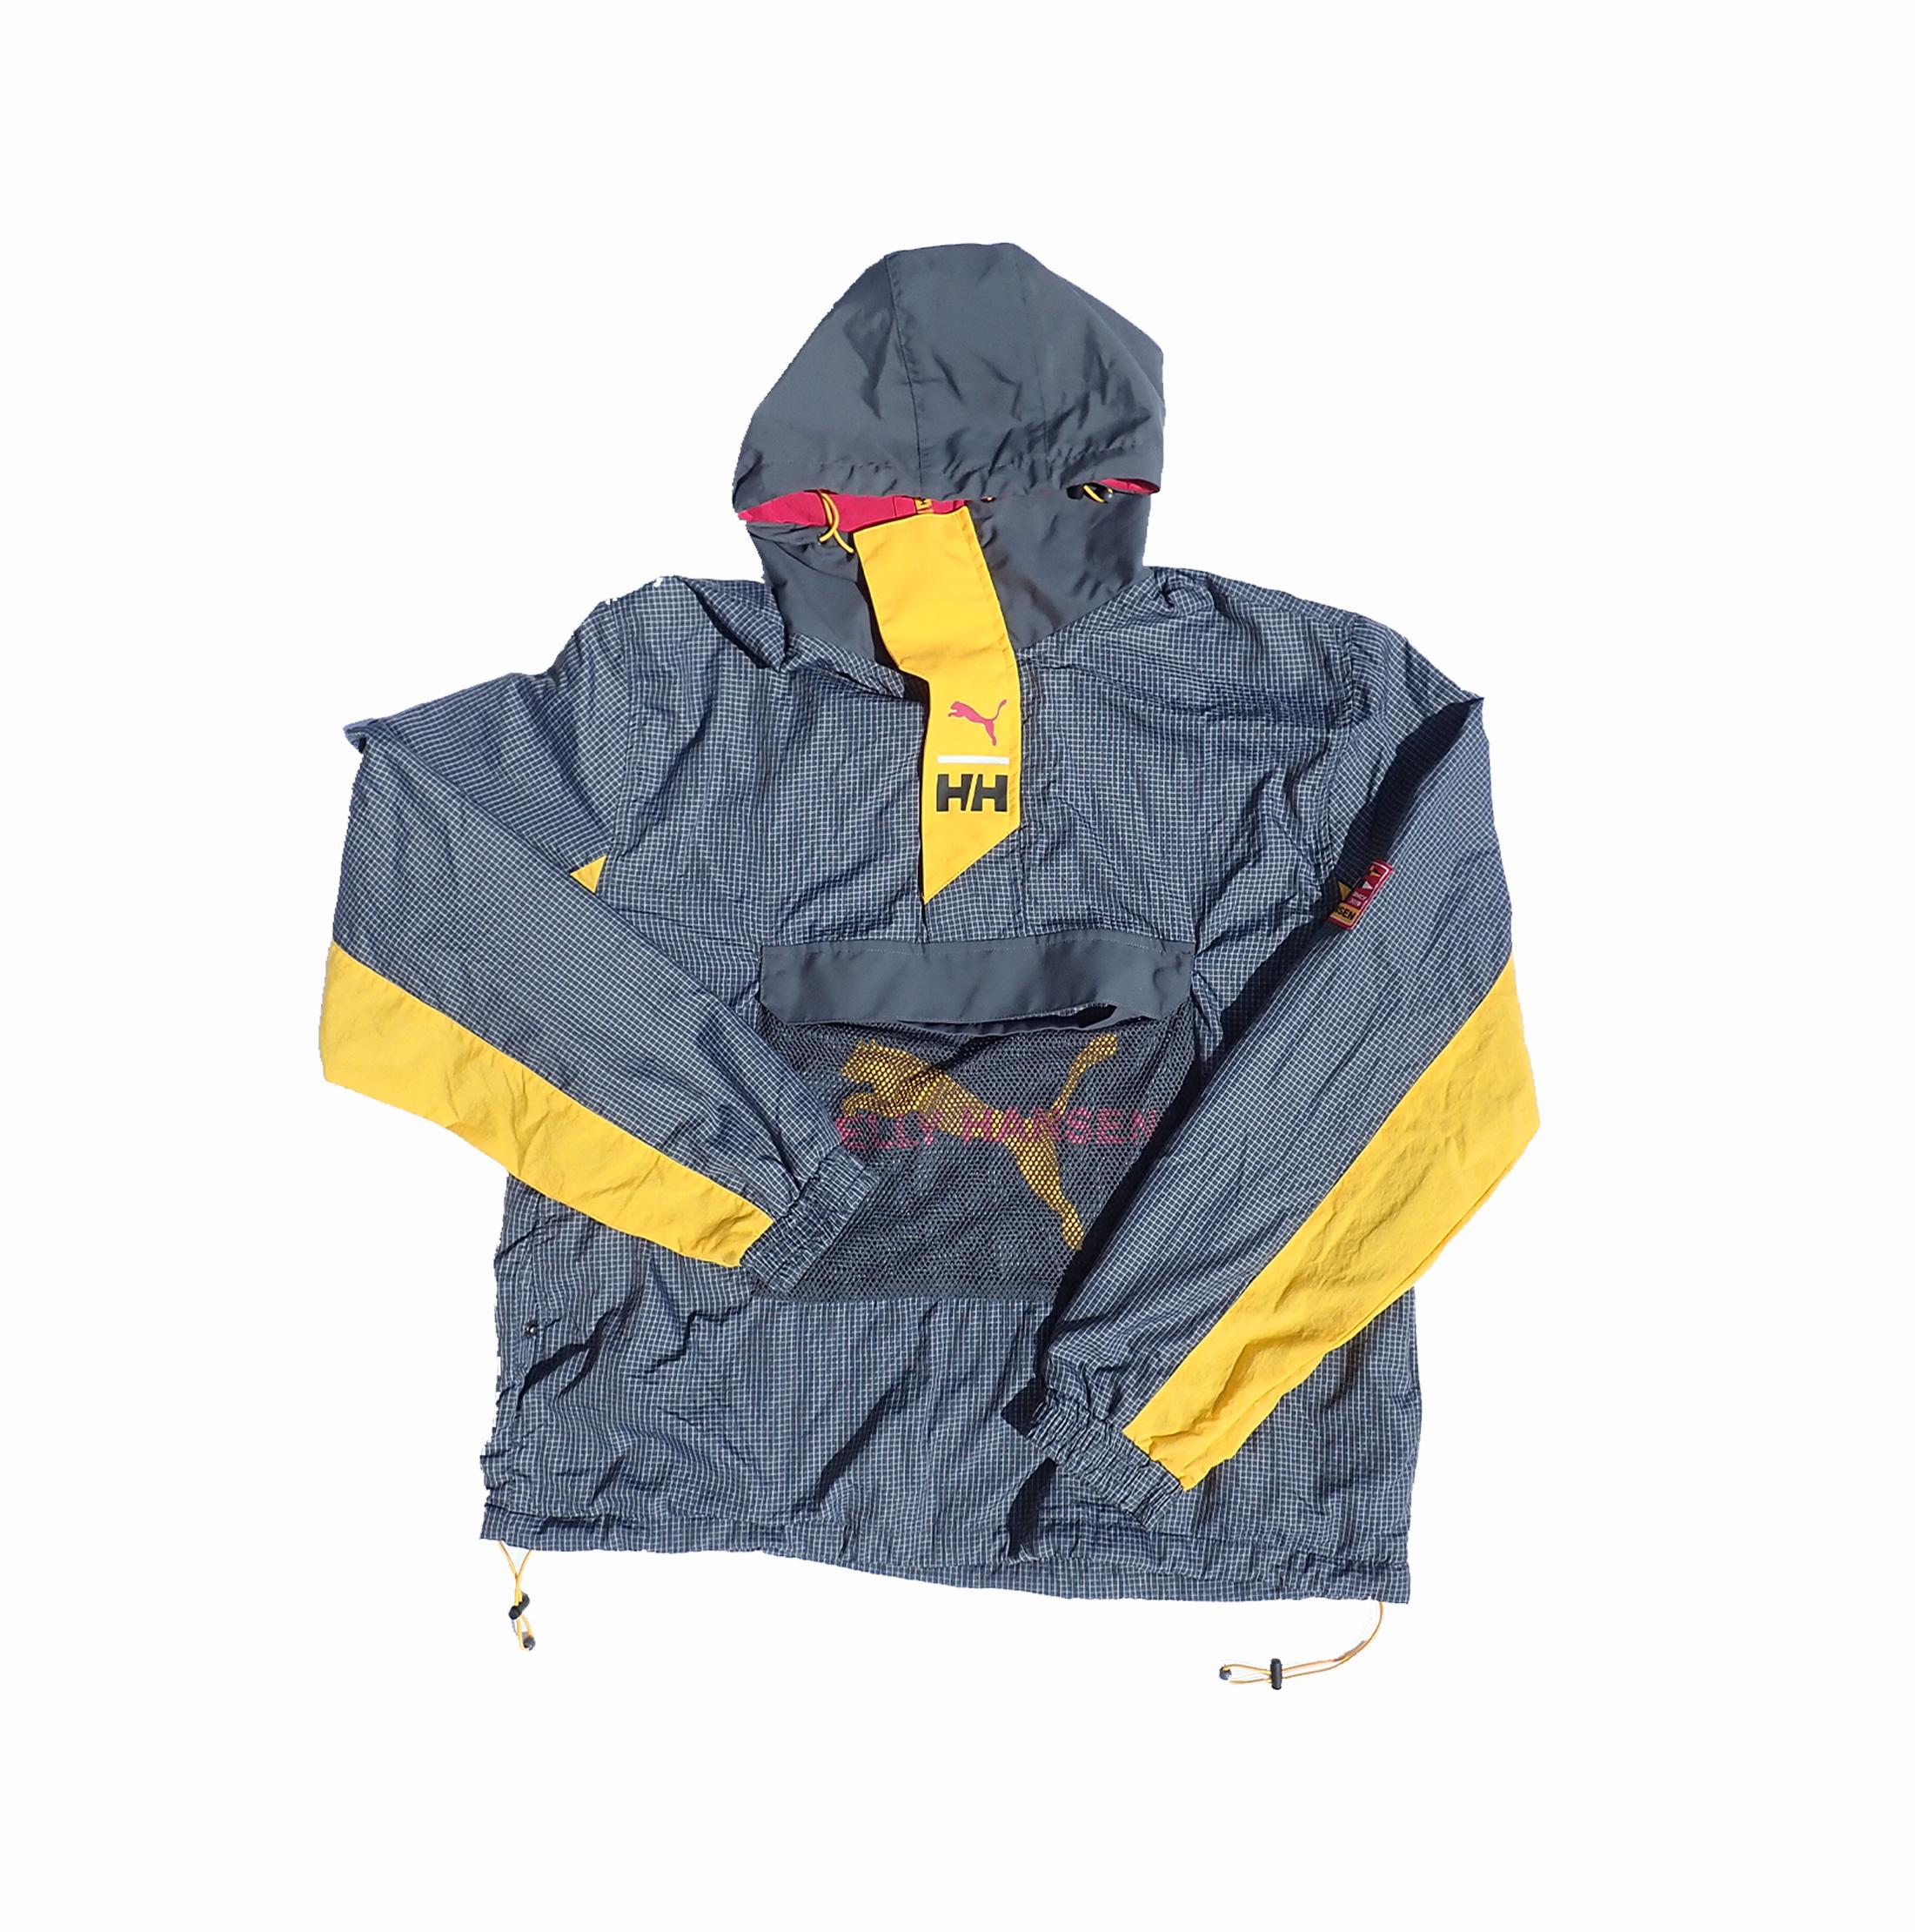 Puma x Helly Hanson Windbreaker Jacket